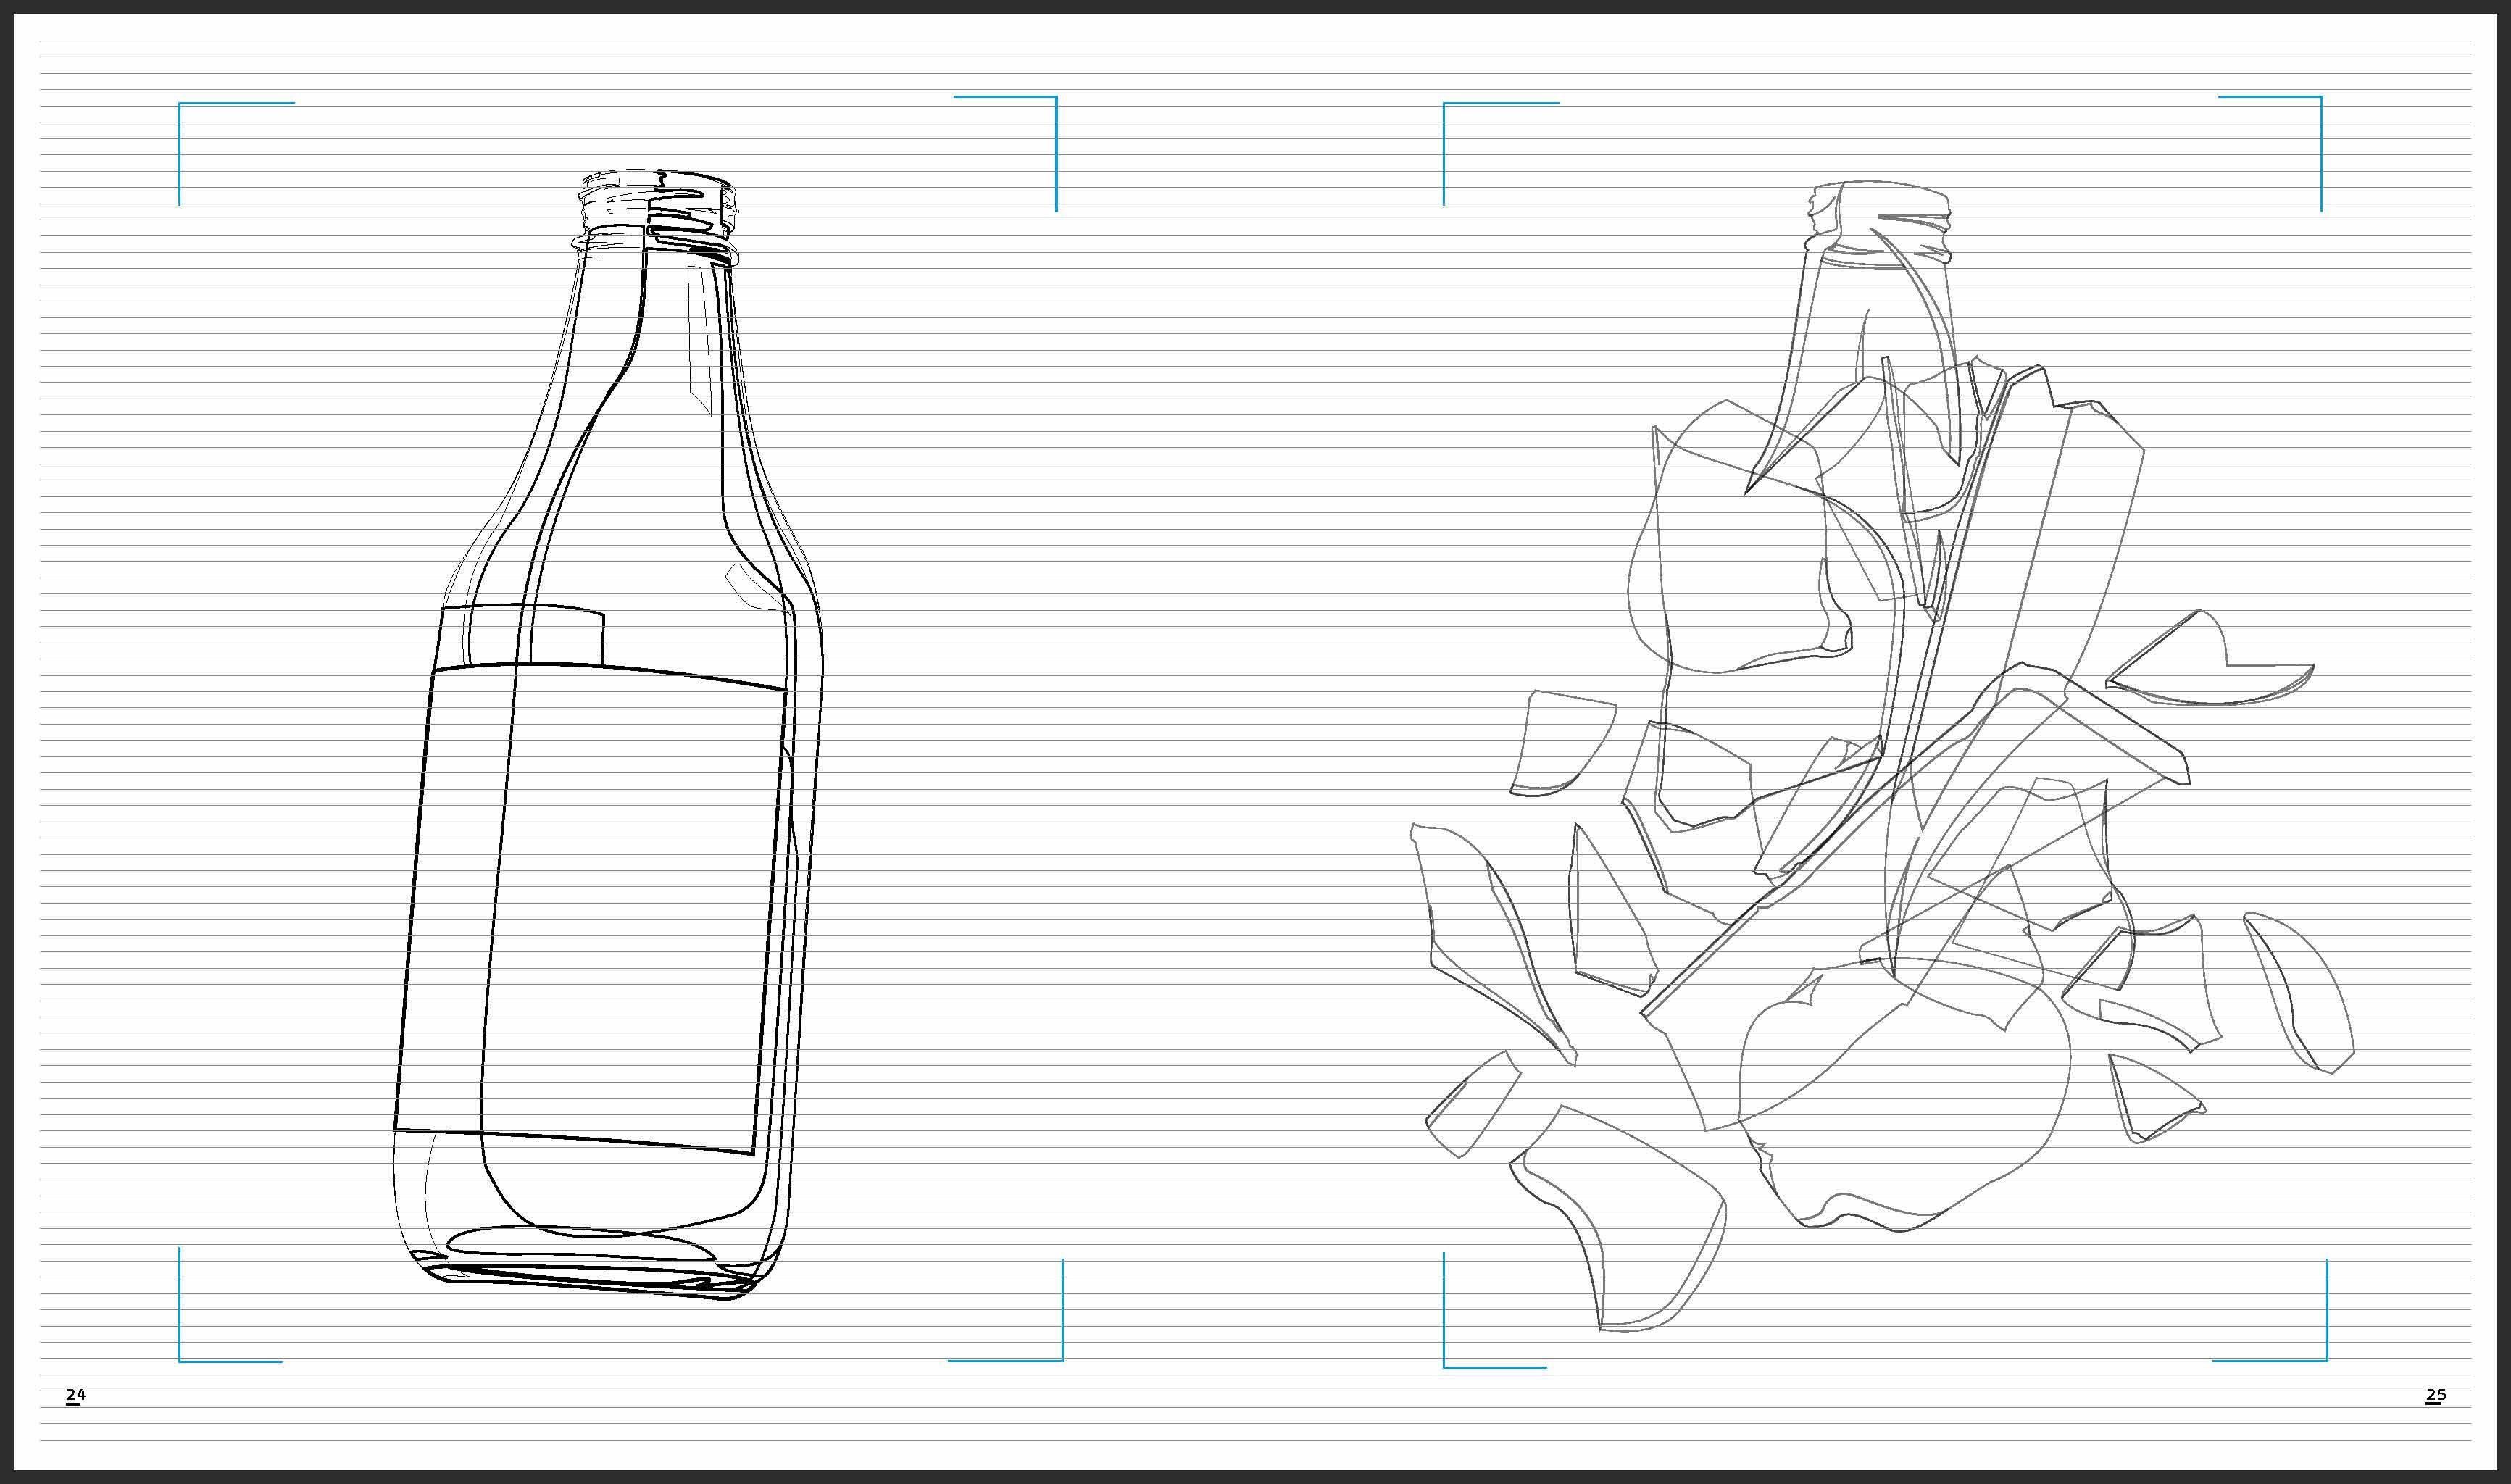 visual_recycling_druckboegen_Seite_013